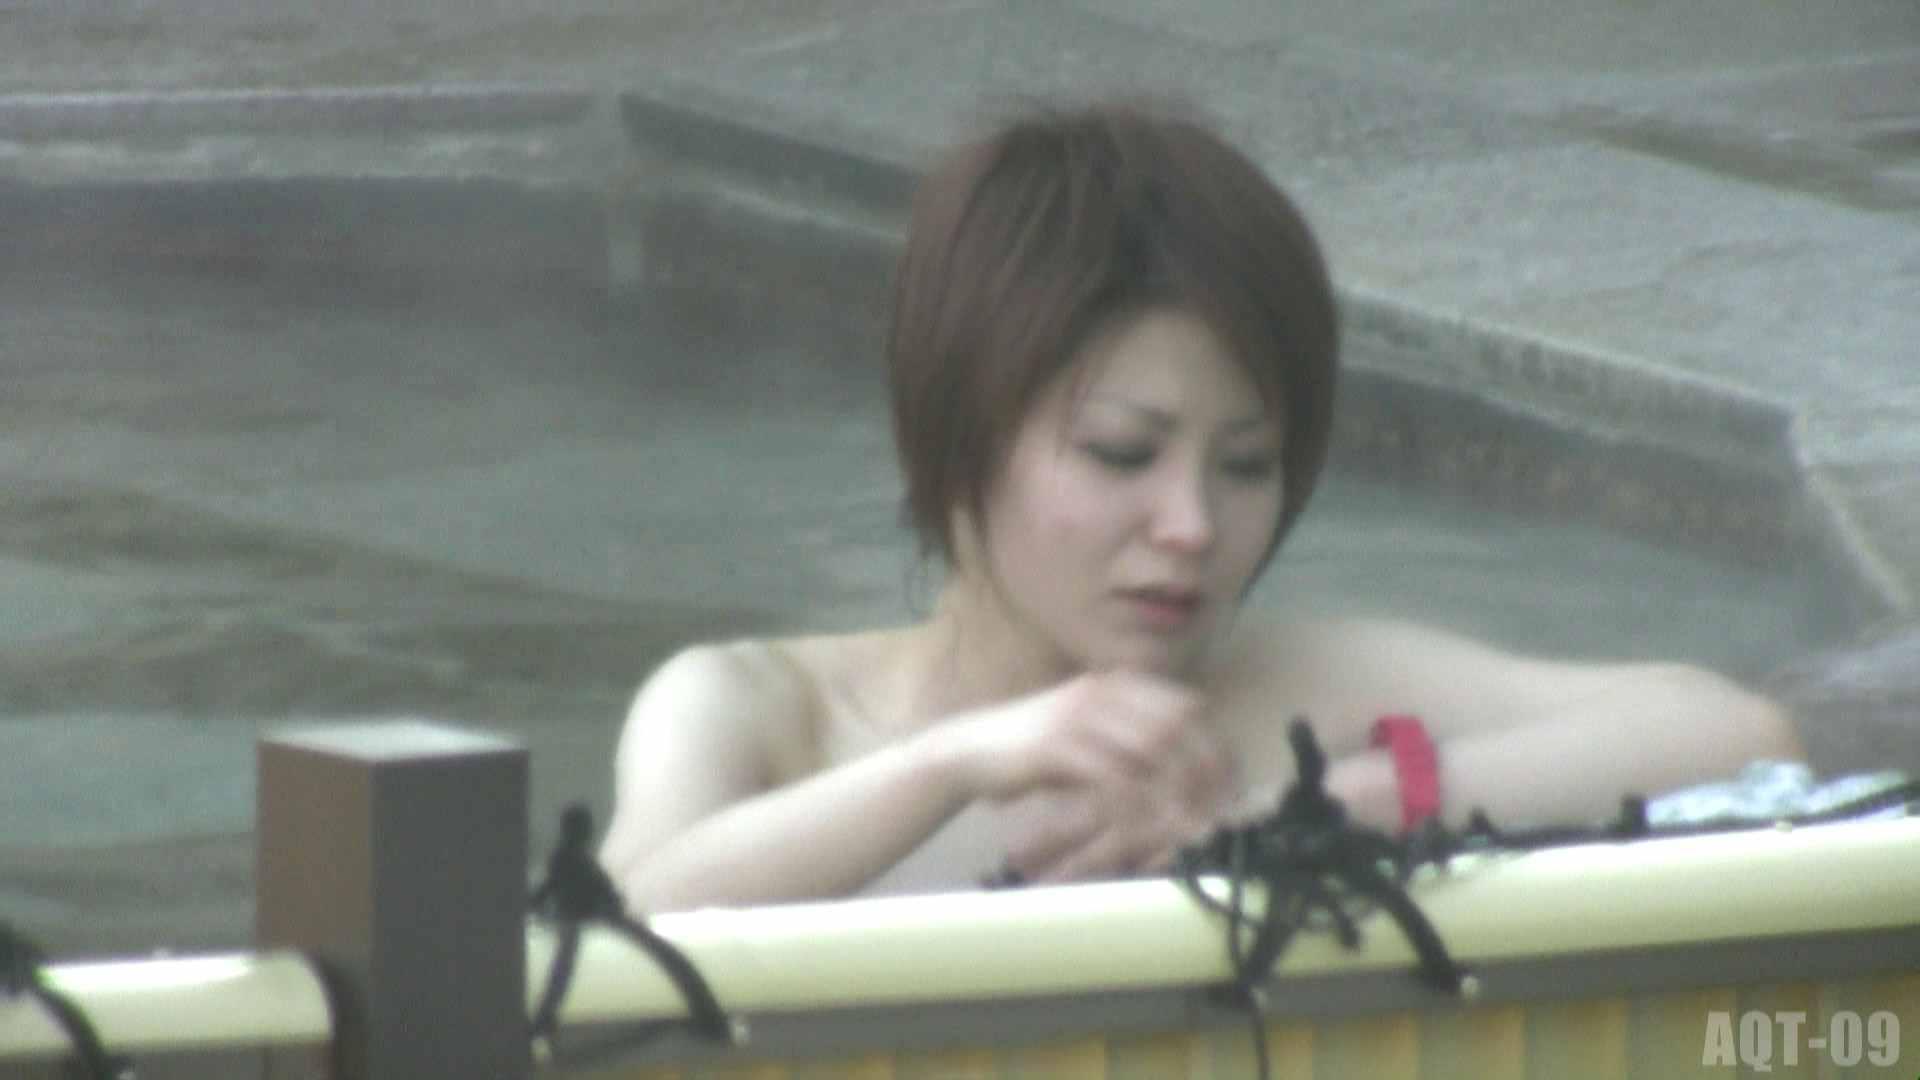 Aquaな露天風呂Vol.779 盗撮 SEX無修正画像 81連発 47